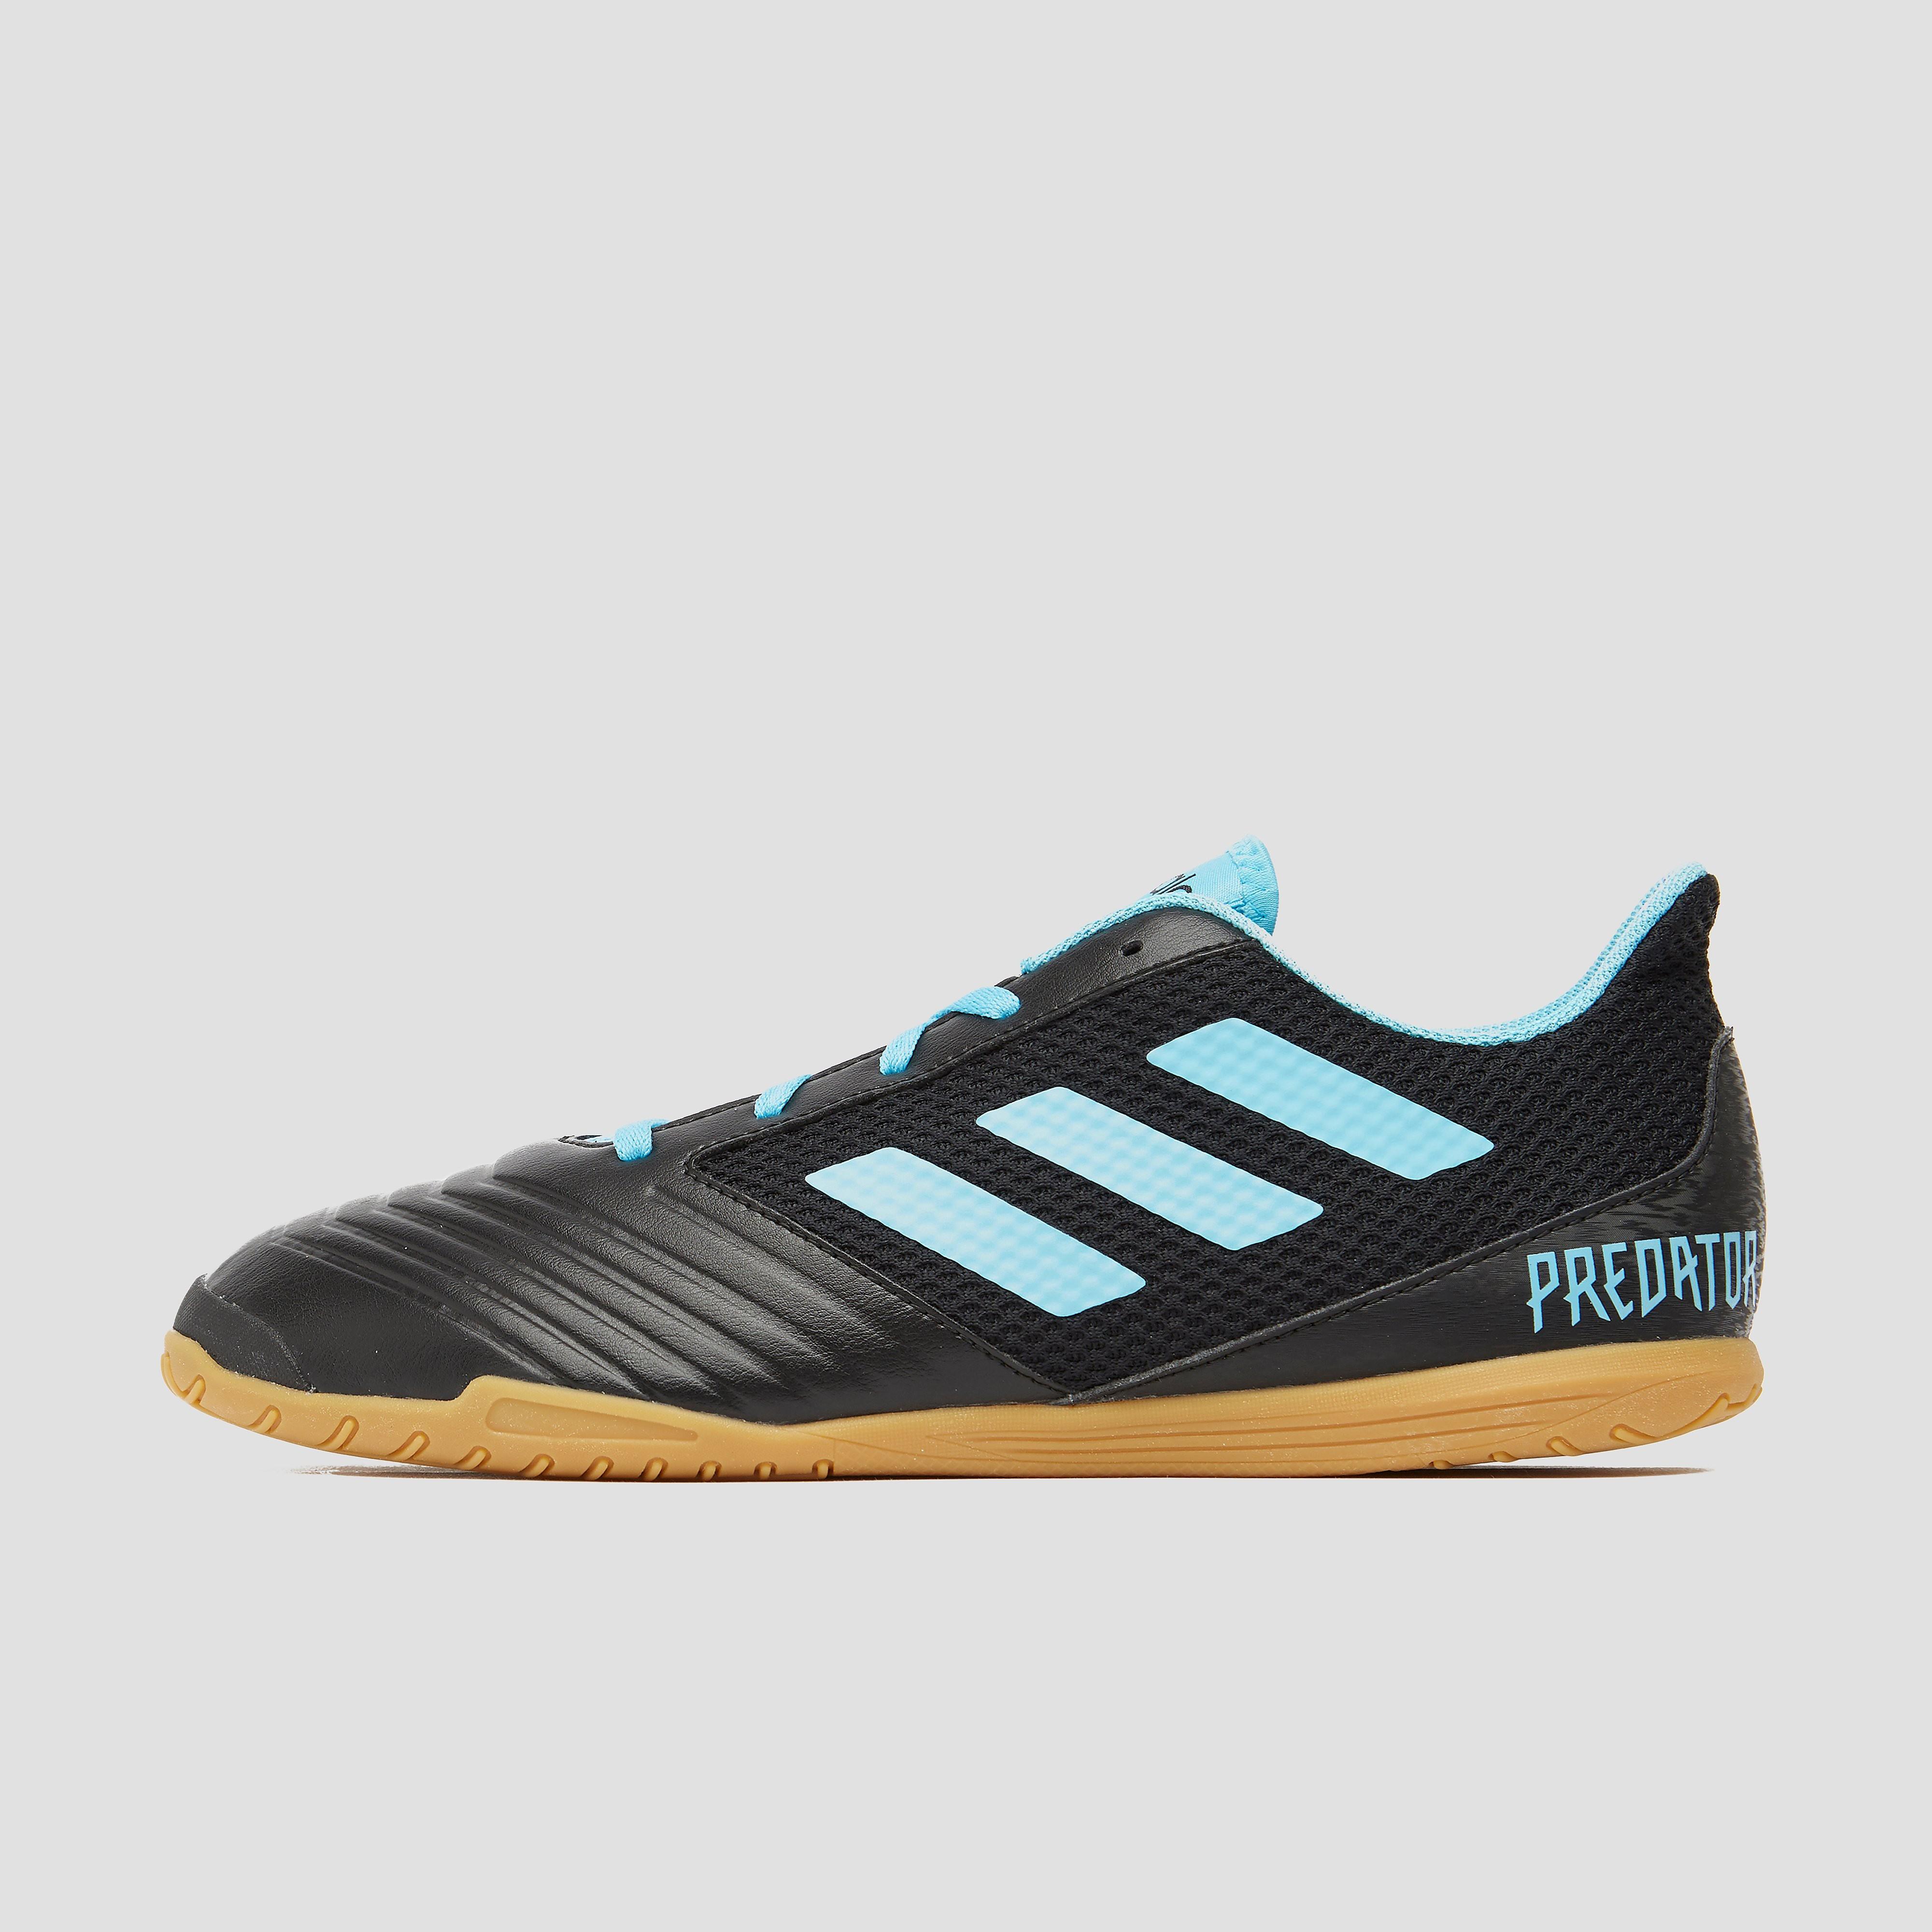 adidas Predator 19.4 in sala voetbalschoenen zwart/blauw Dames